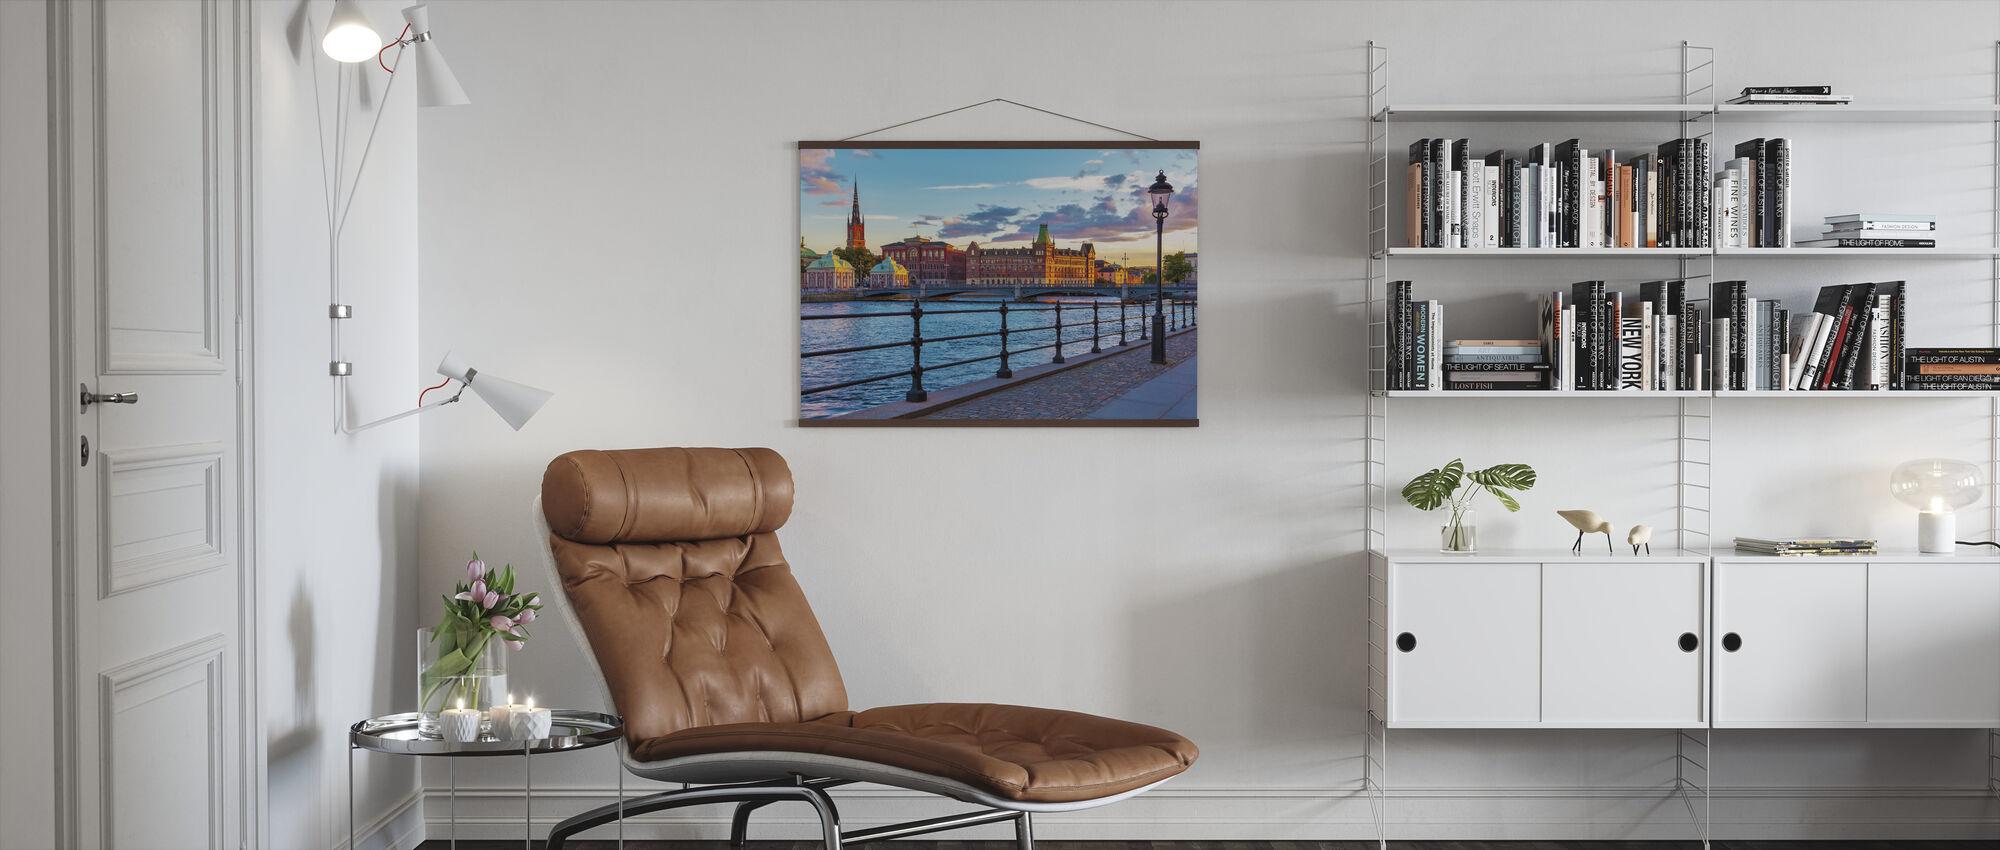 Stockholm - Old Town - Poster - Living Room